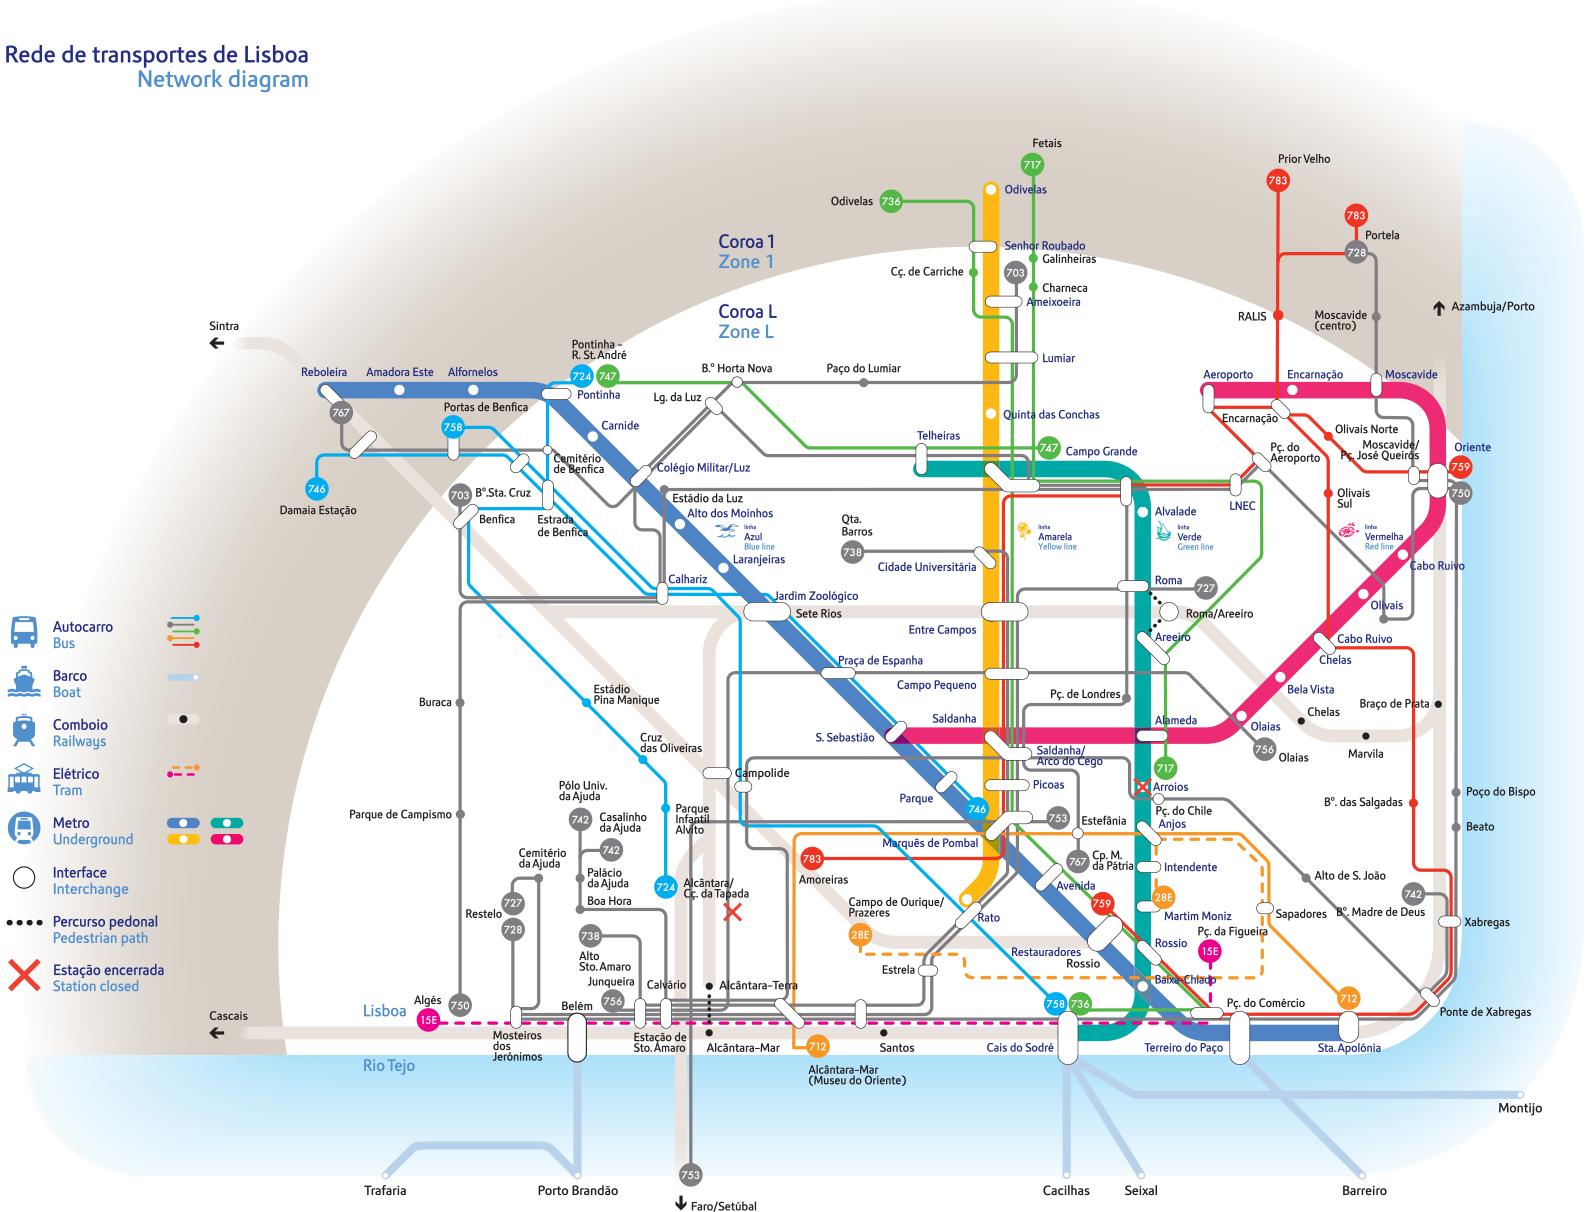 Lisbon Transport Network Bestguide Portugal